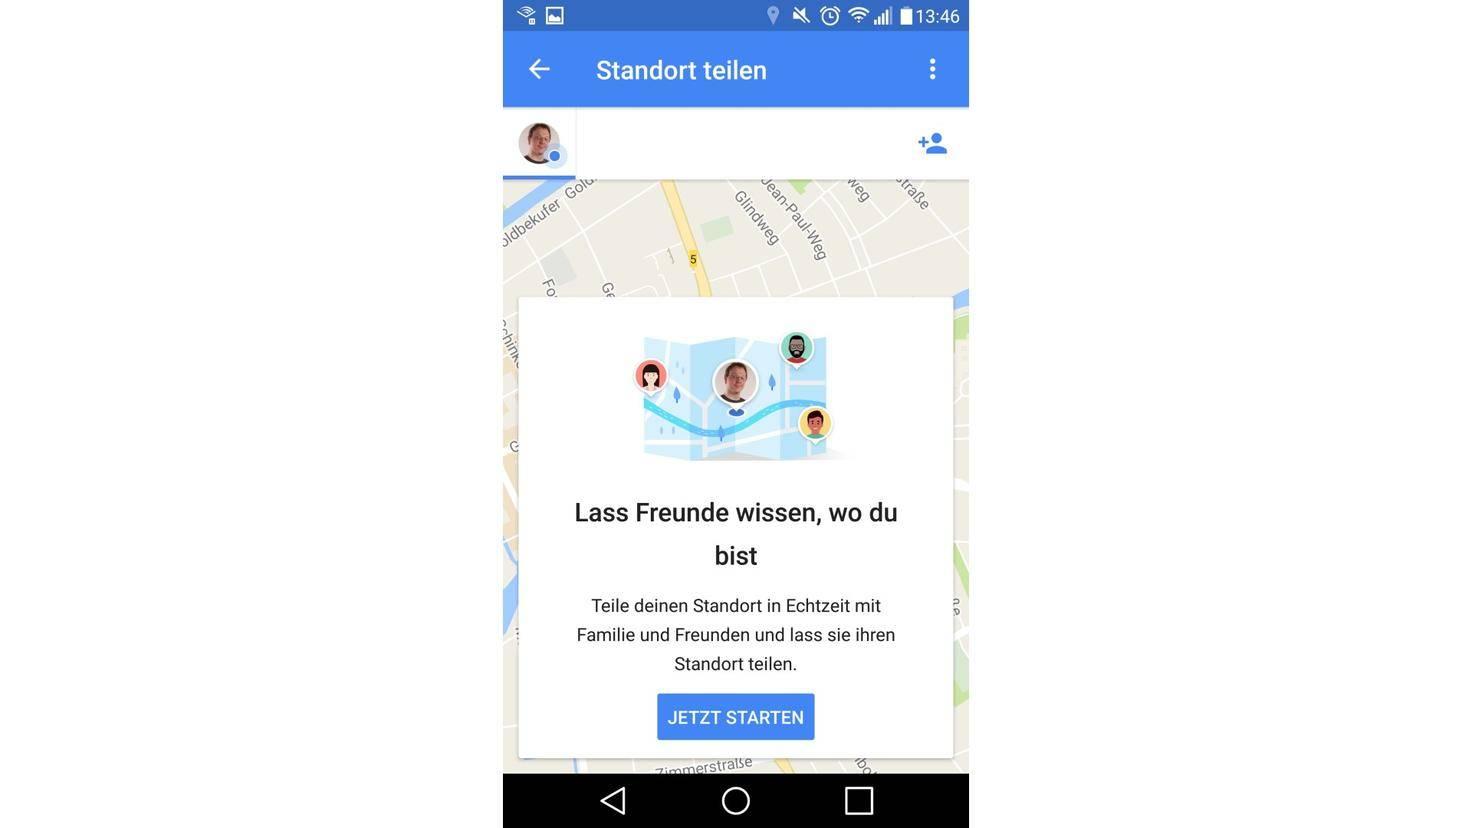 Google Maps Standort teilen